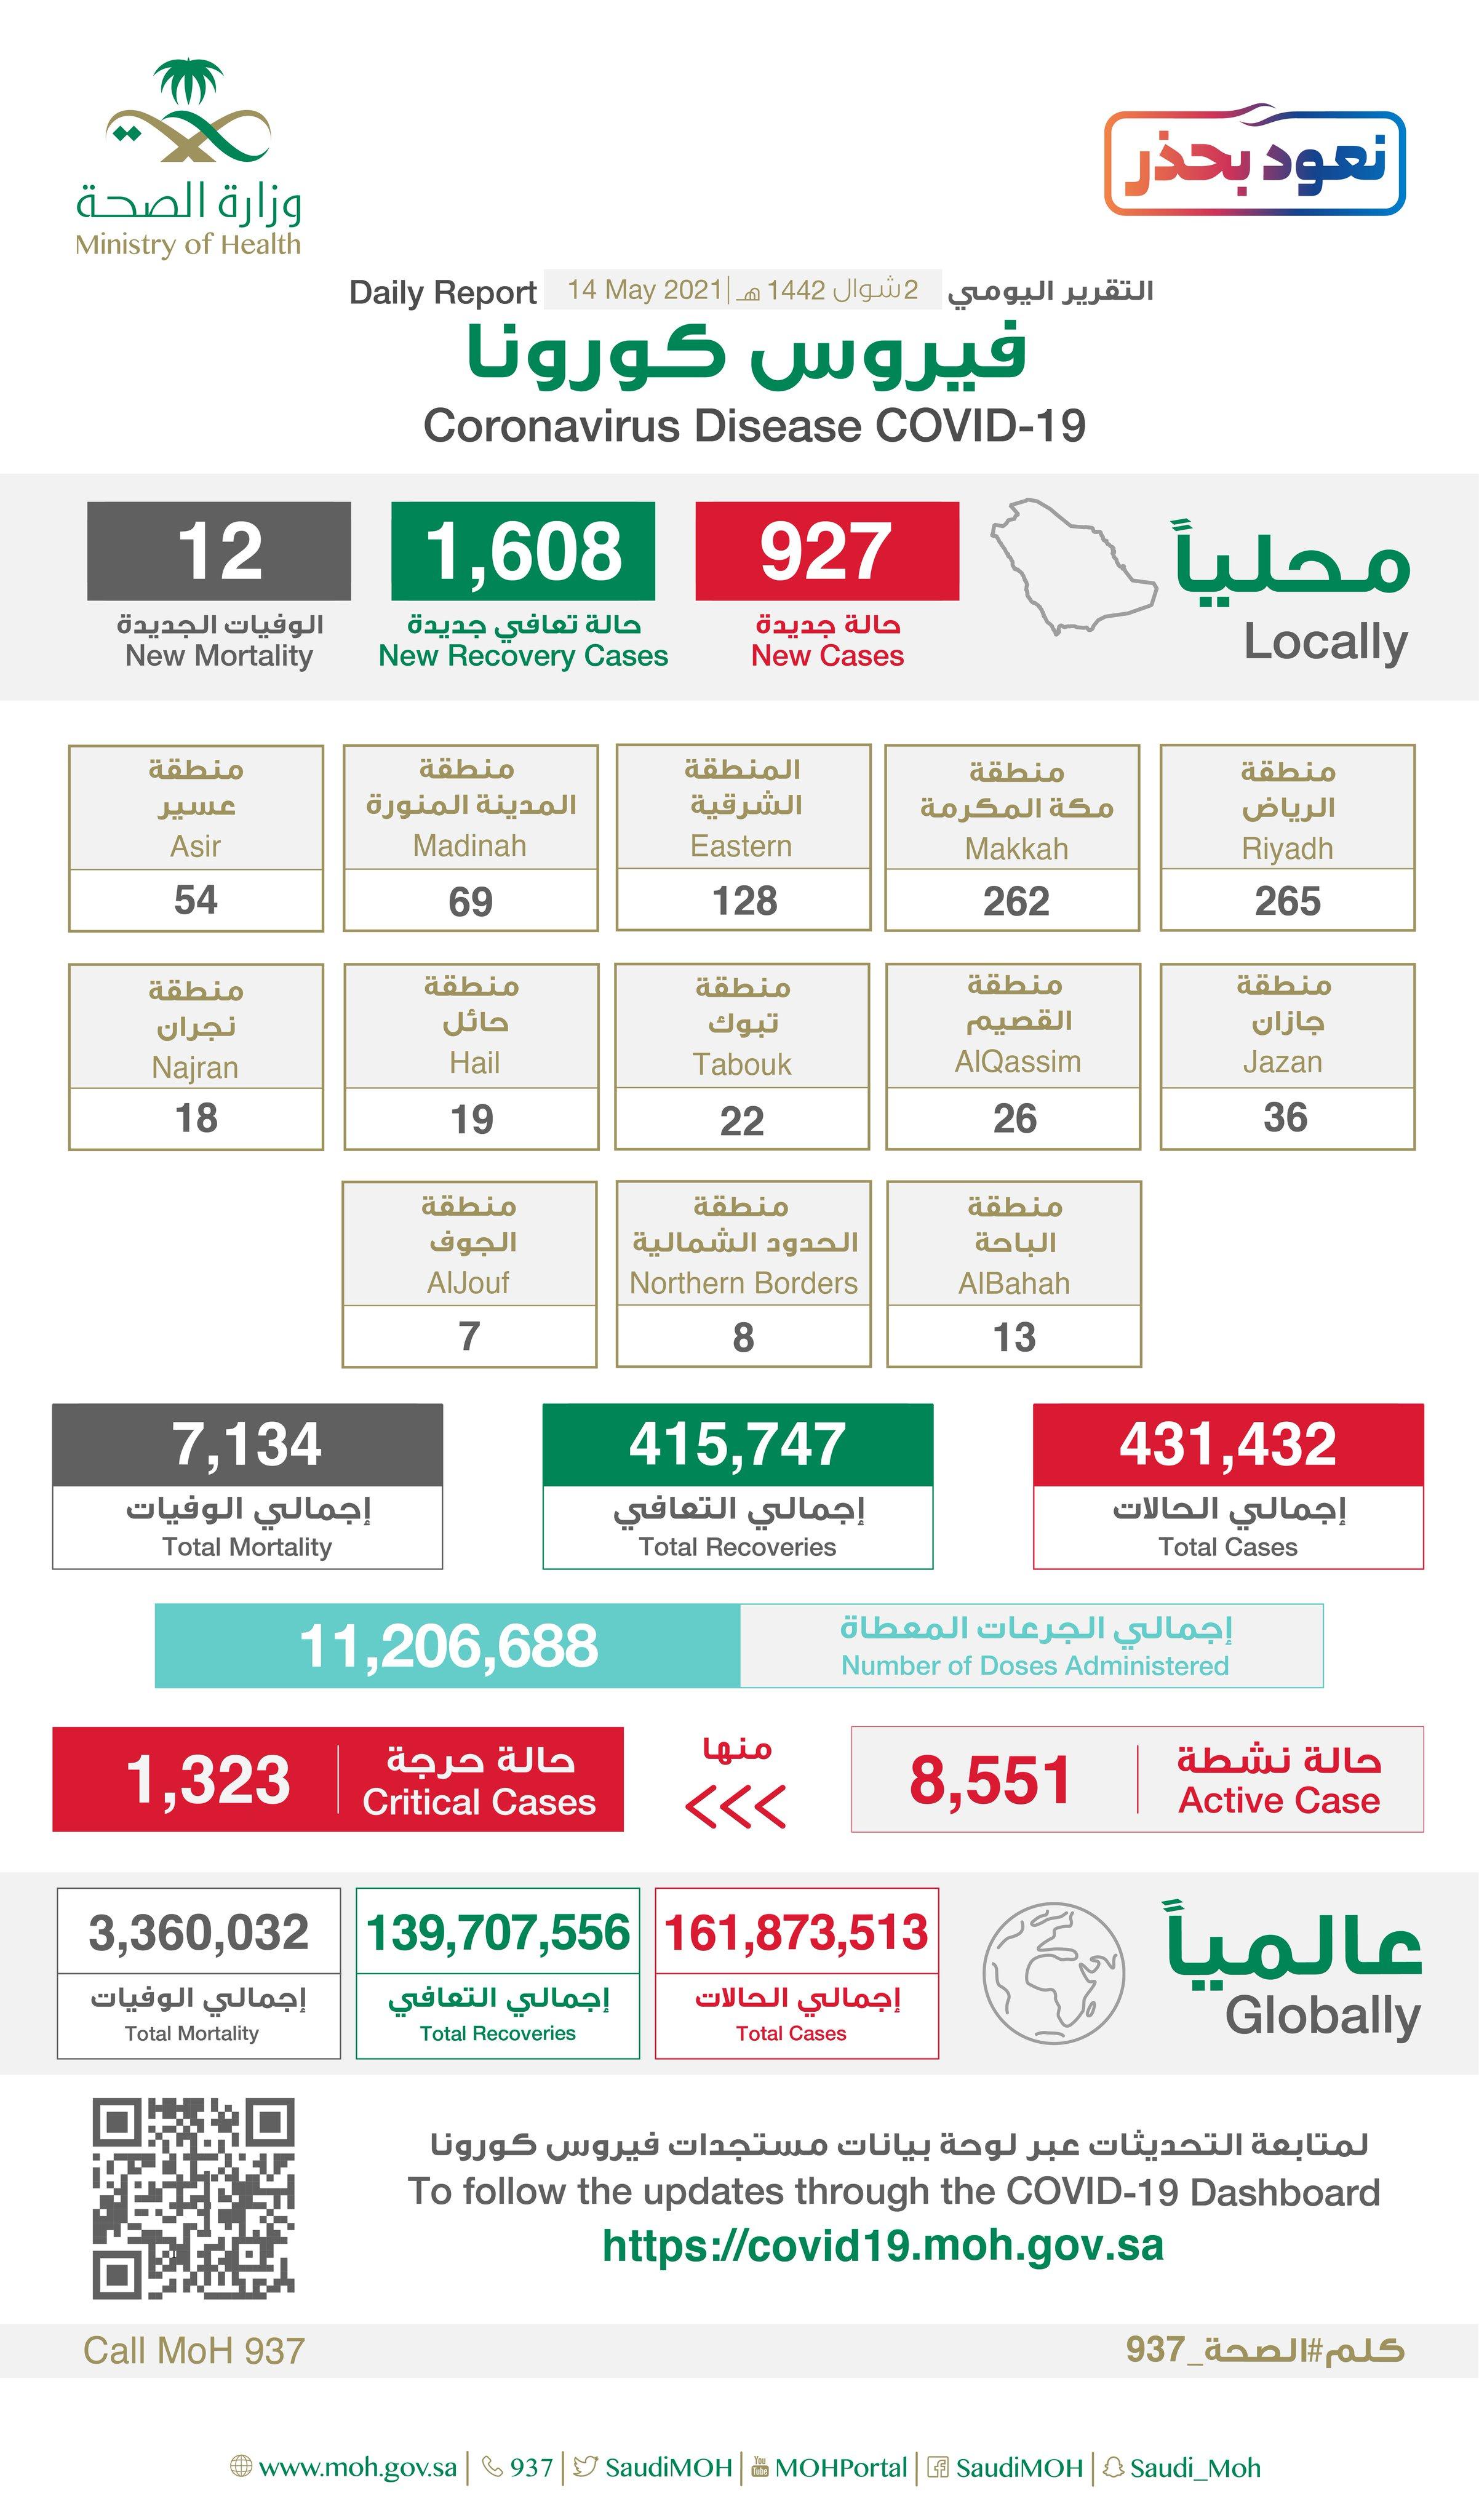 Saudi Arabia Coronavirus : Total Cases :431,432 , New Cases : 927 ,Cured : 415,747 , Deaths: 7,134, Active Cases : 8,551